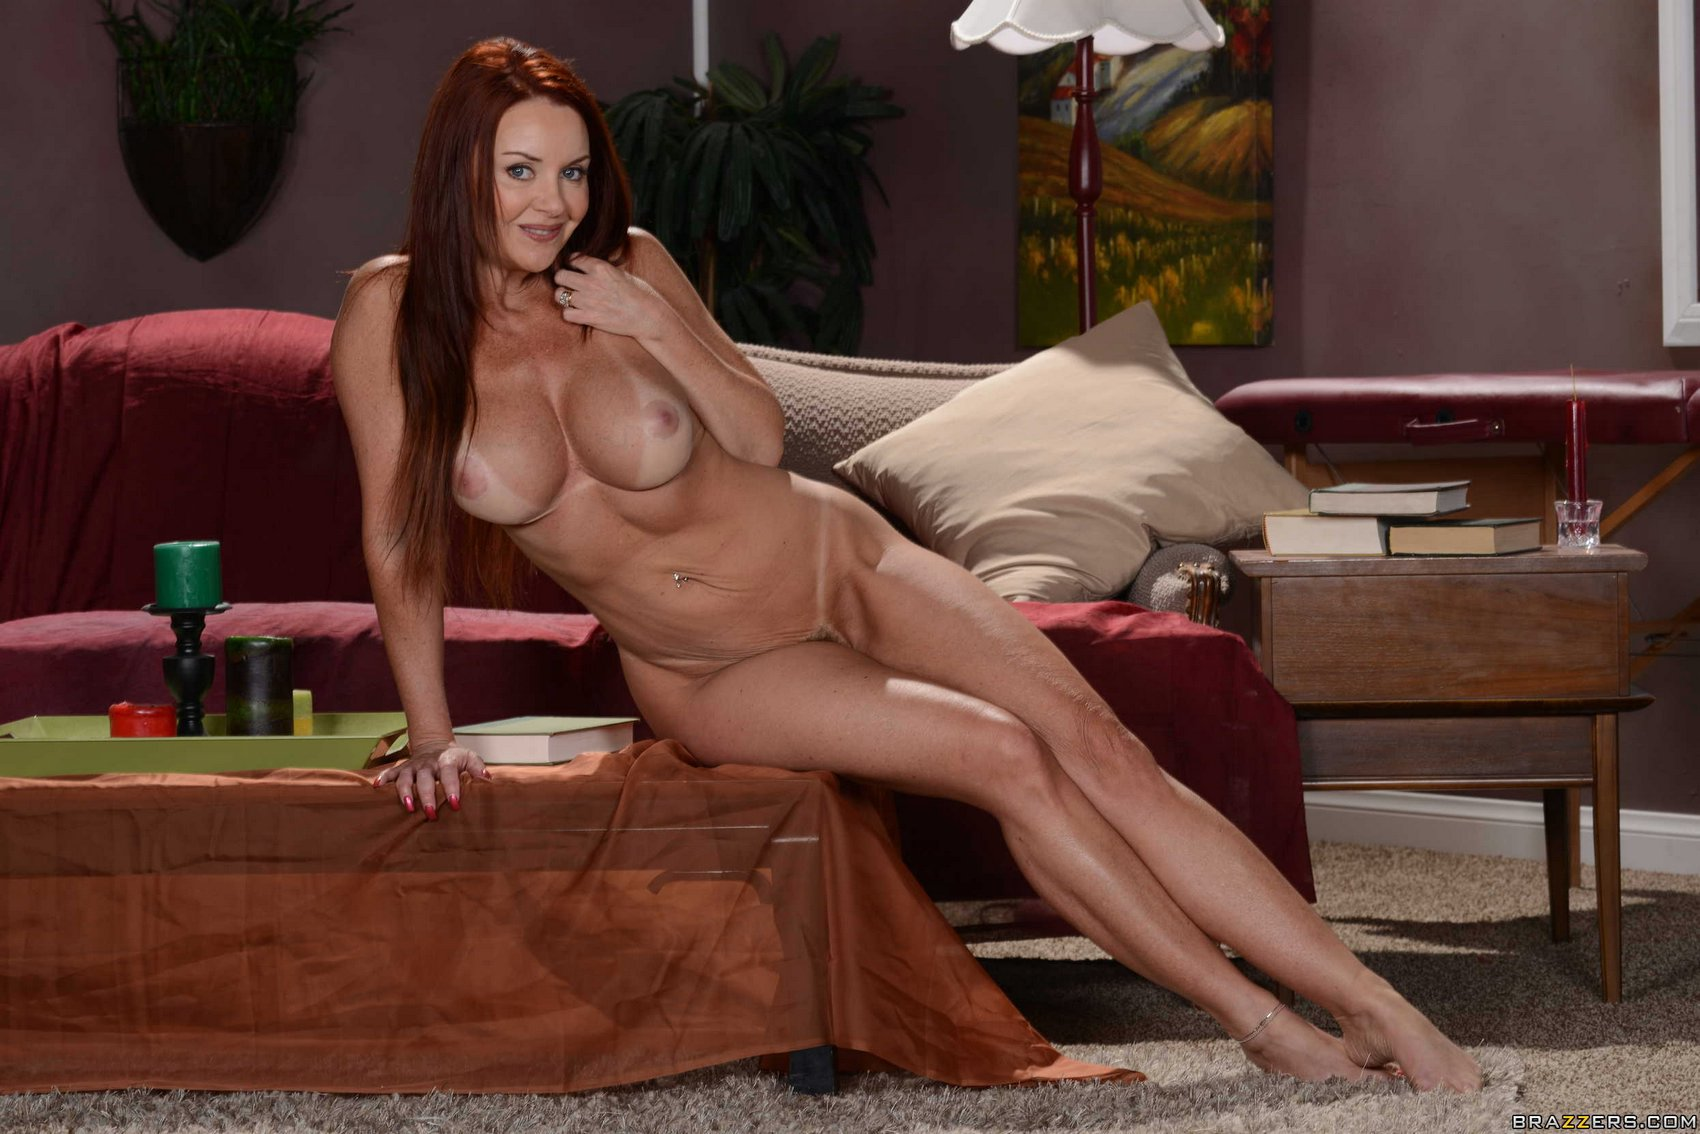 Congratulate, very Janet mason porn star nude very valuable